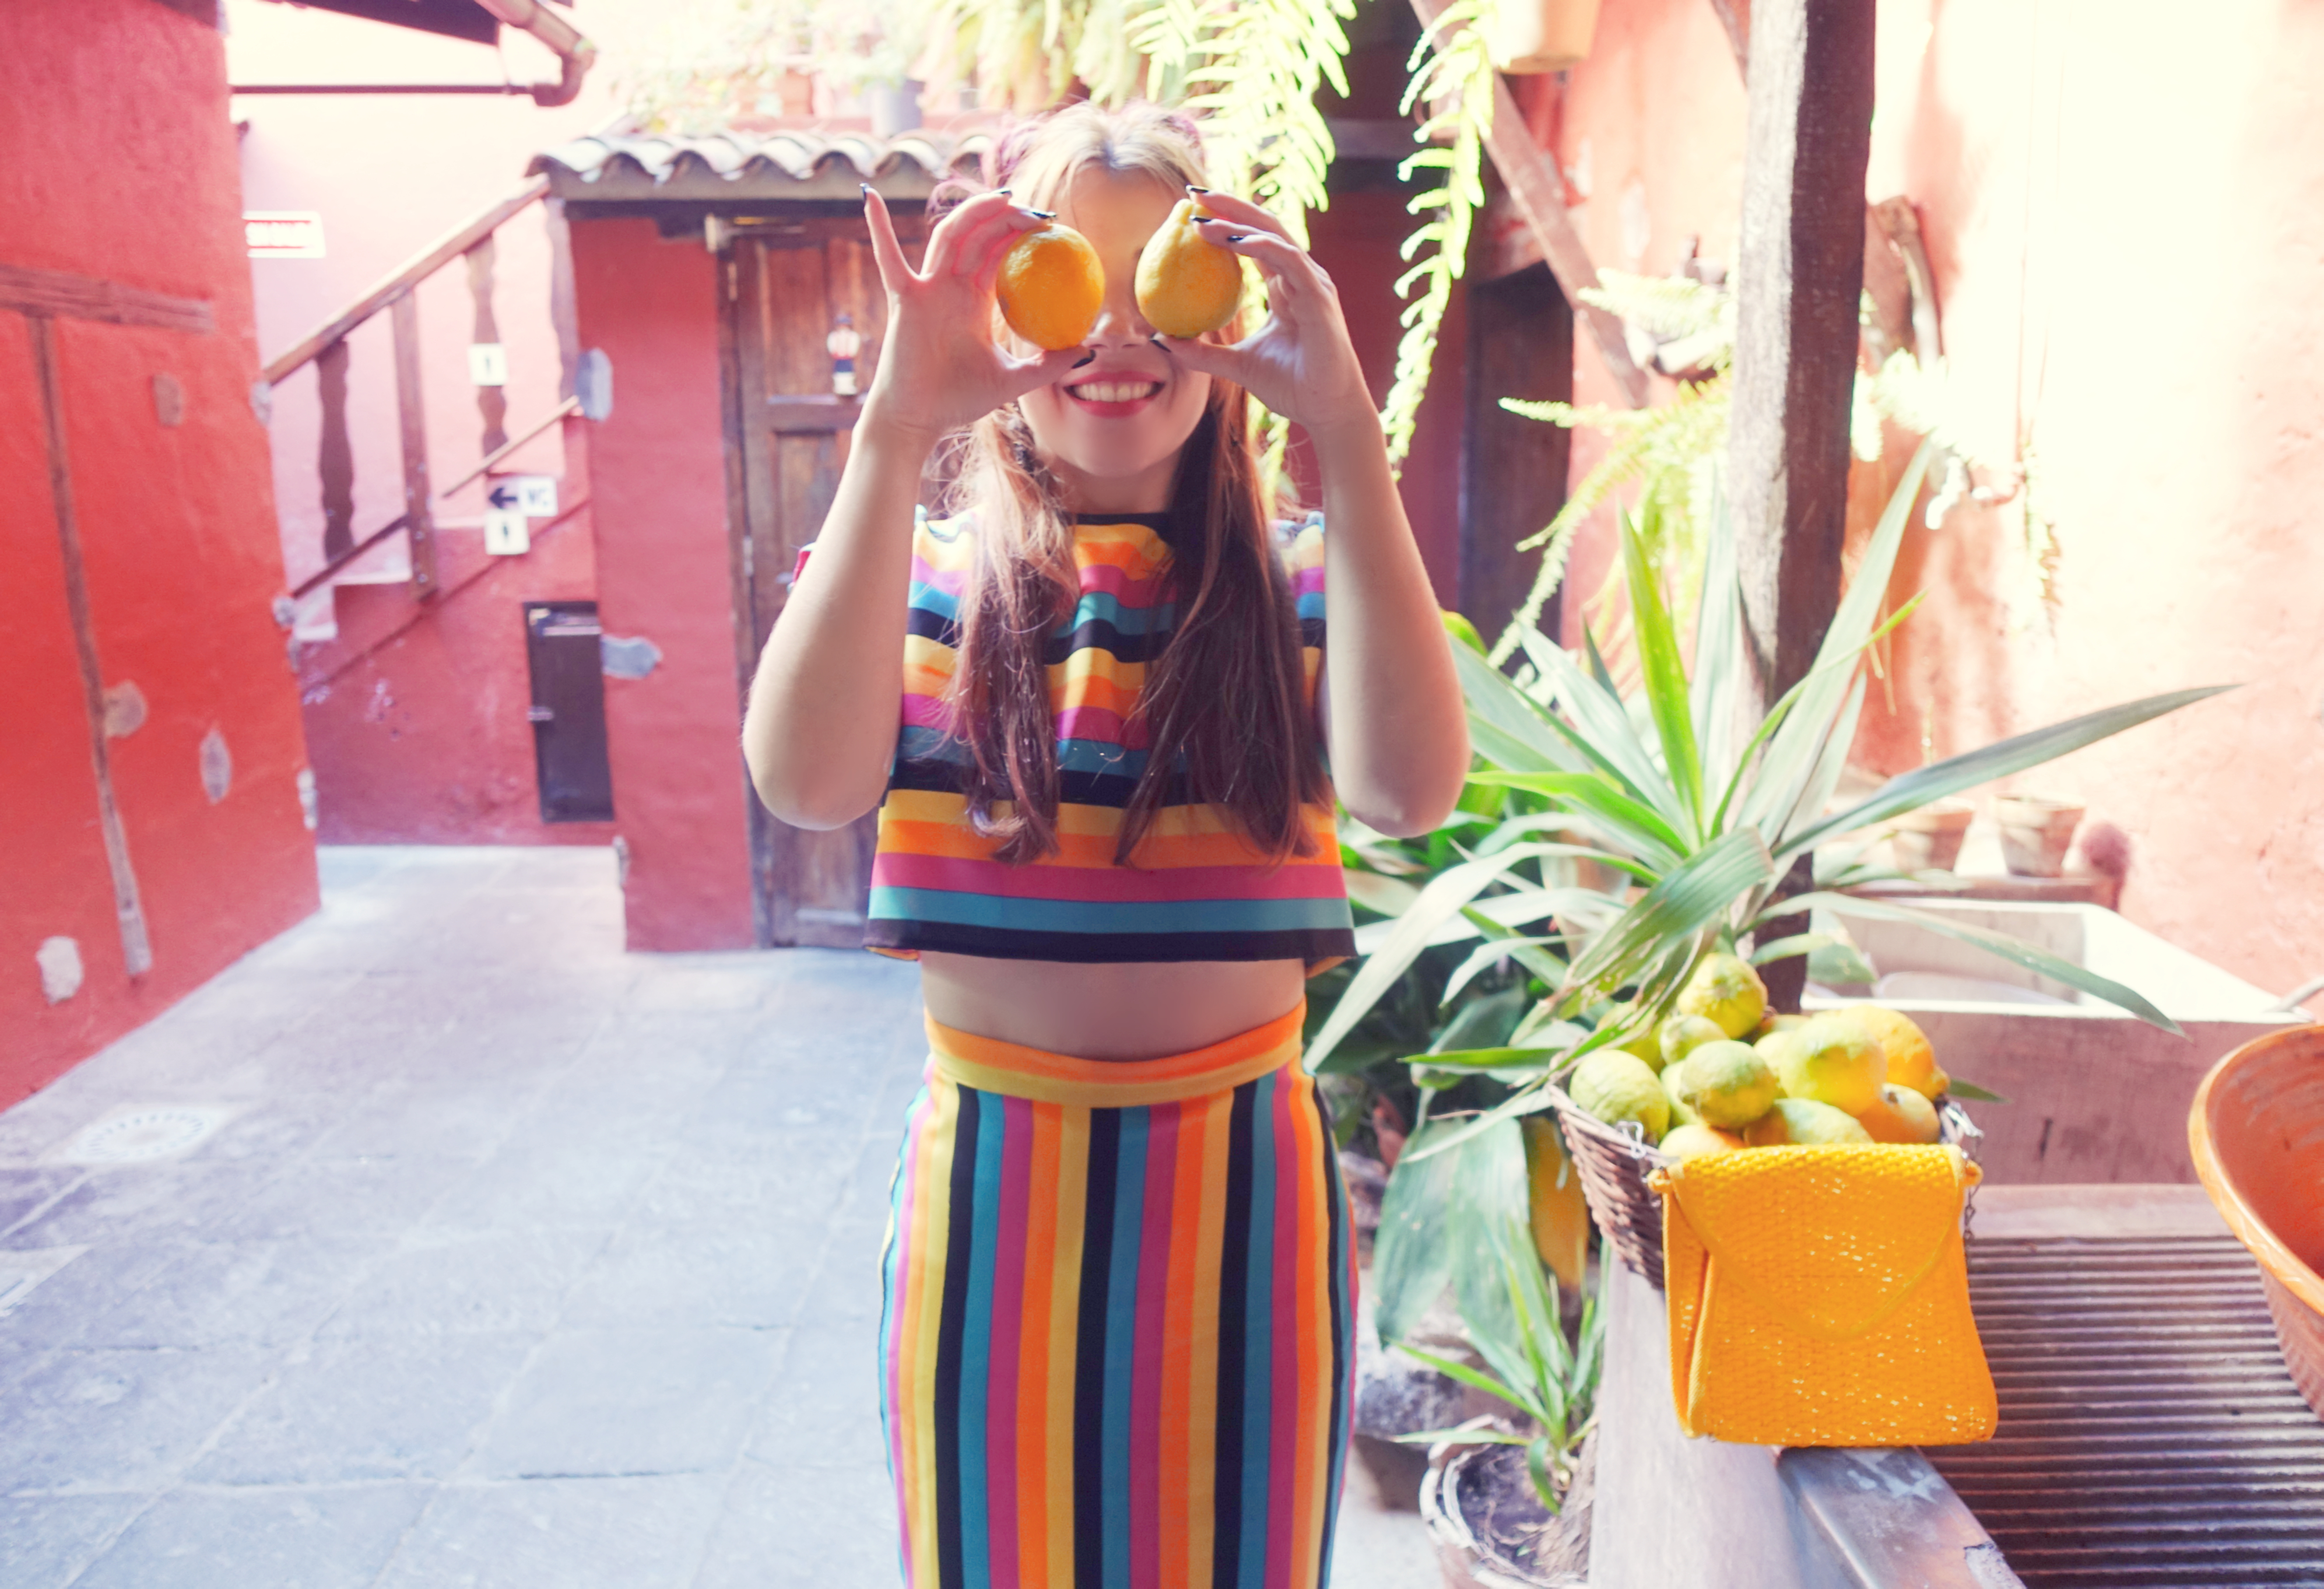 Vestidos-de-rayas-blog-de-moda-ChicAdicta-PiensaenChic-influencer-fashionista-ana-de-valle-moda-Tenerife-Chic-adicta-Piensa-en-chic